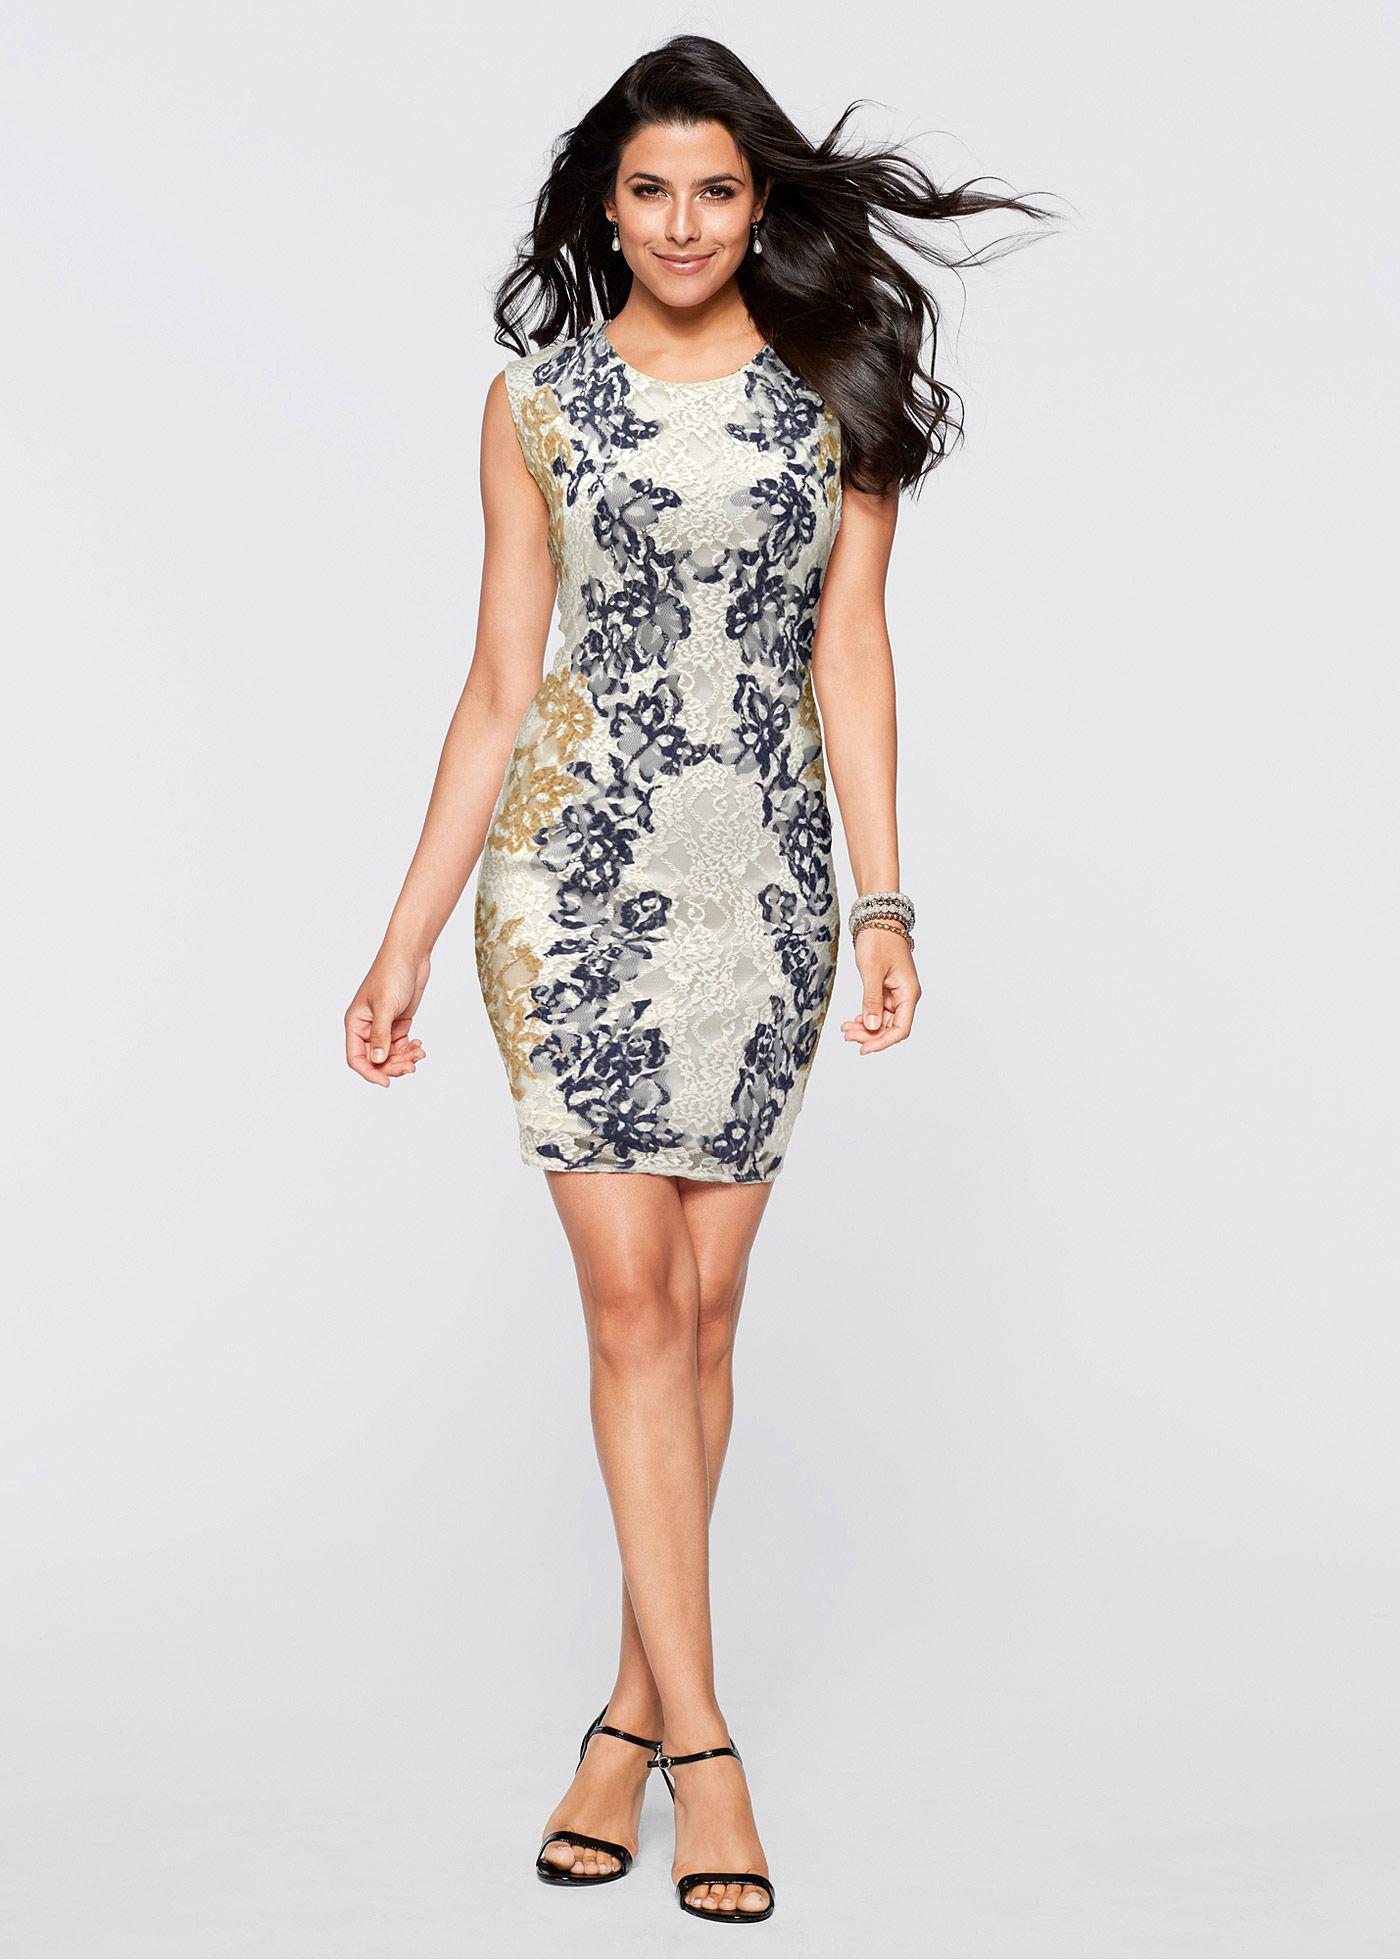 df4857a90b Vestido de renda branco-creme azul encomendar agora na loja on-line  bonprix.de R  139